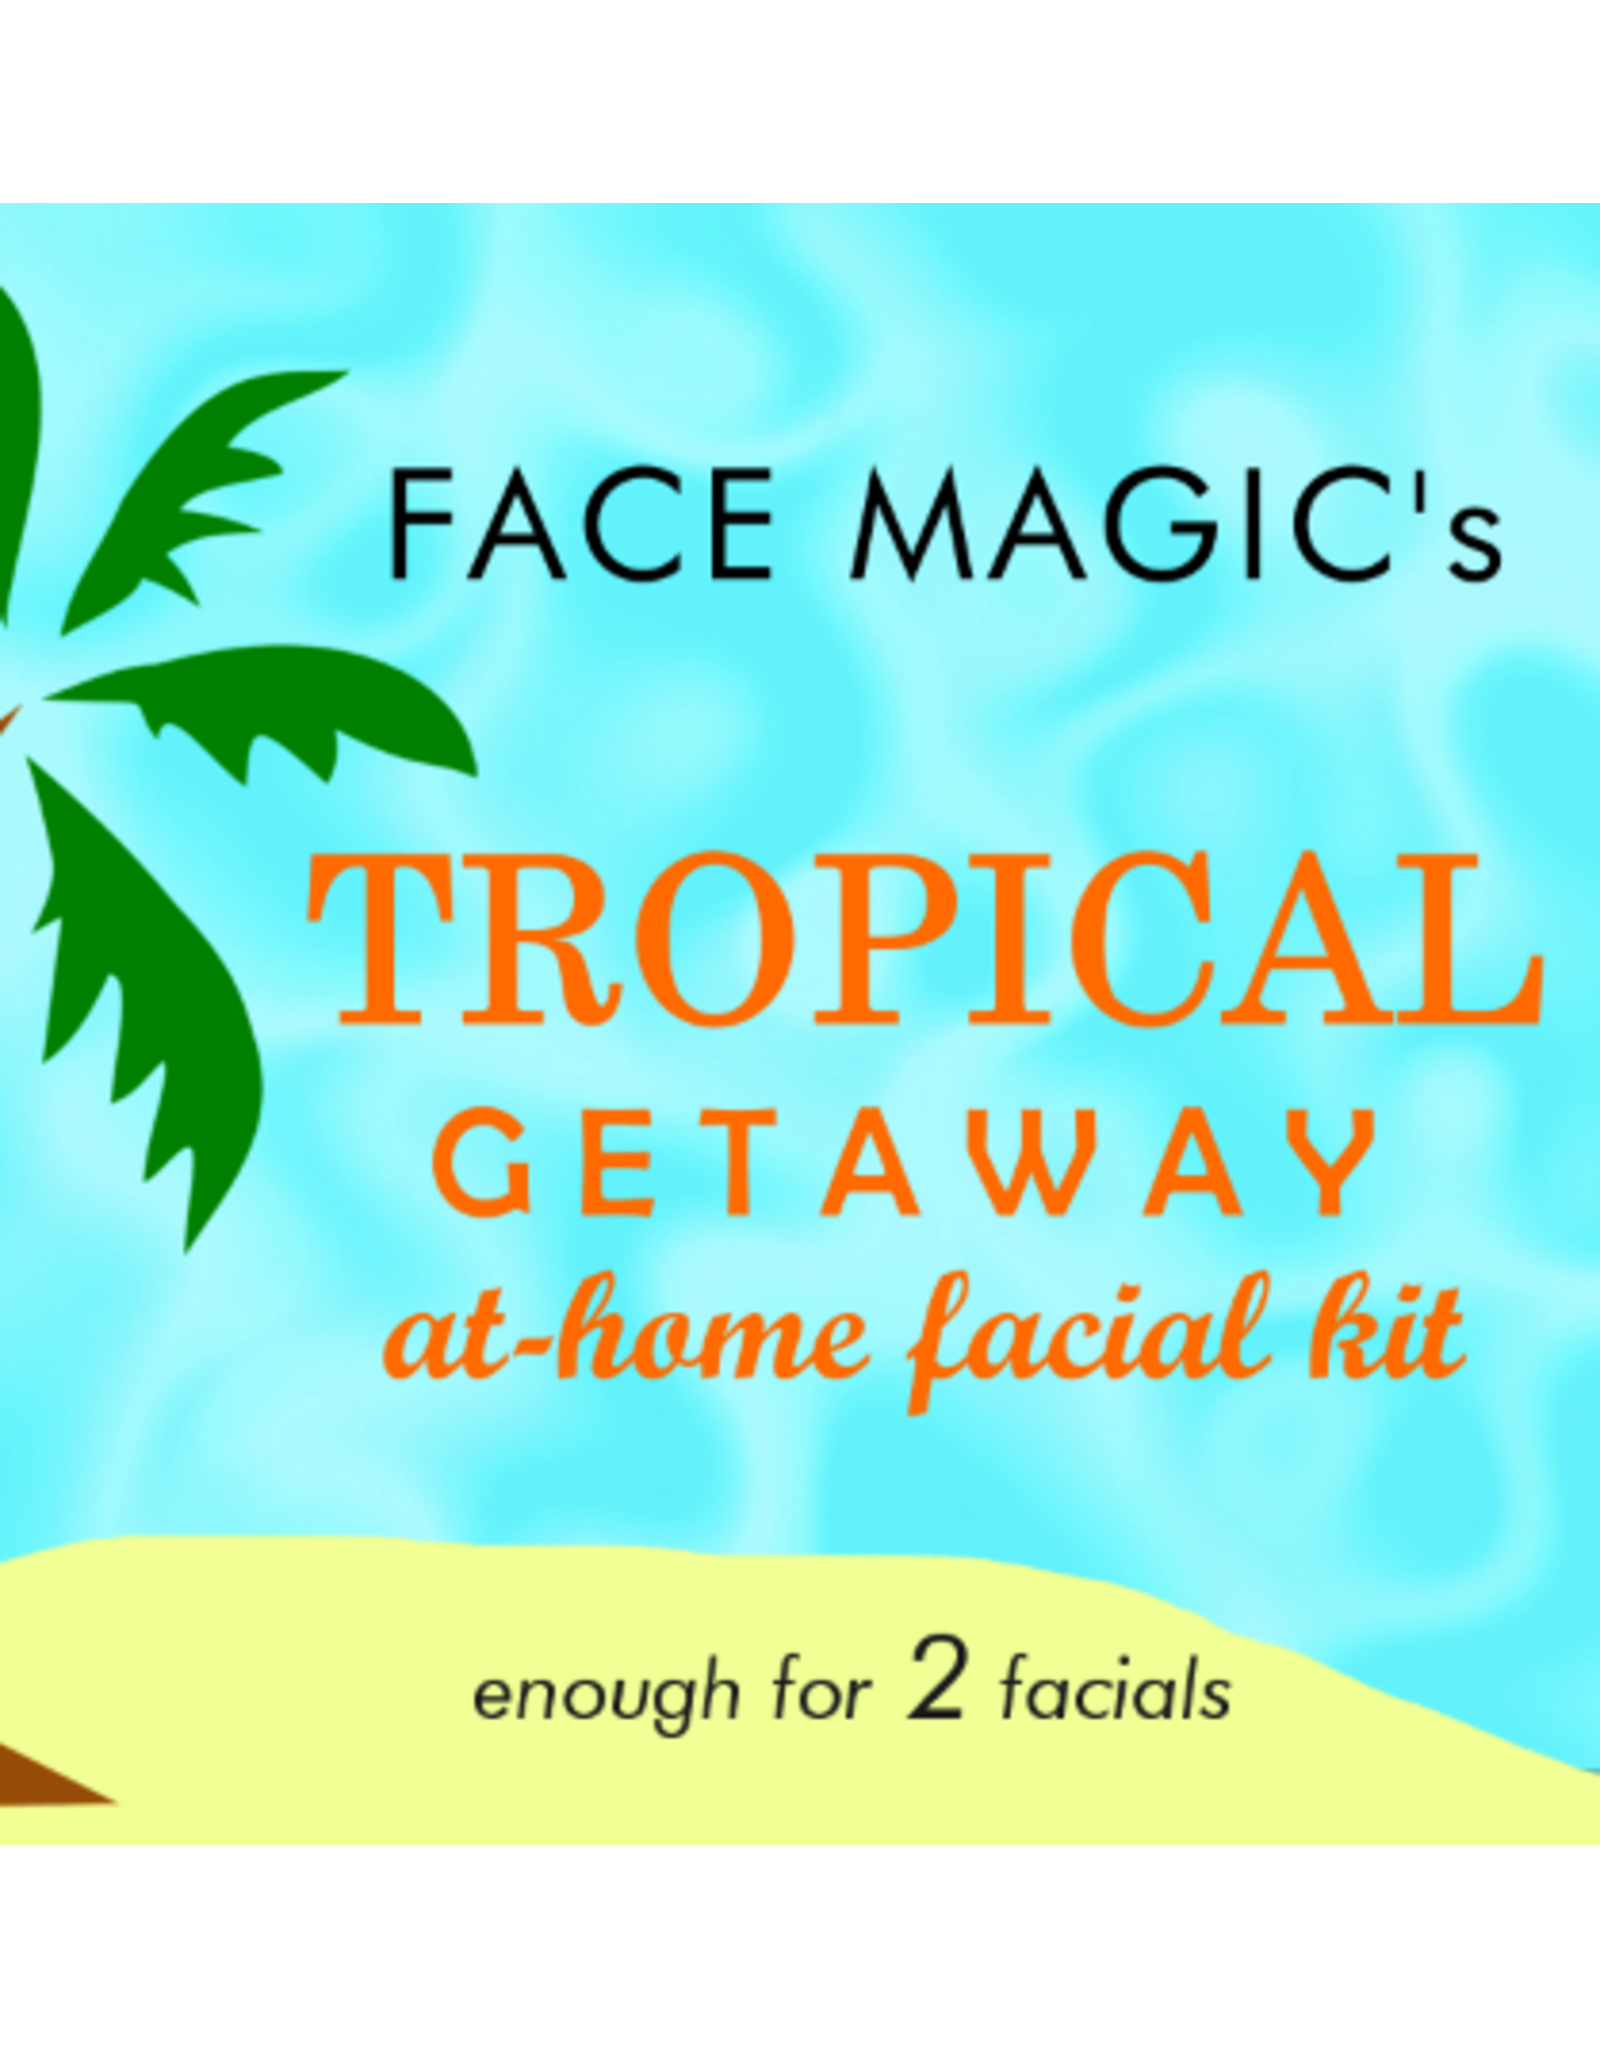 Tropical Getaway Facial Kit